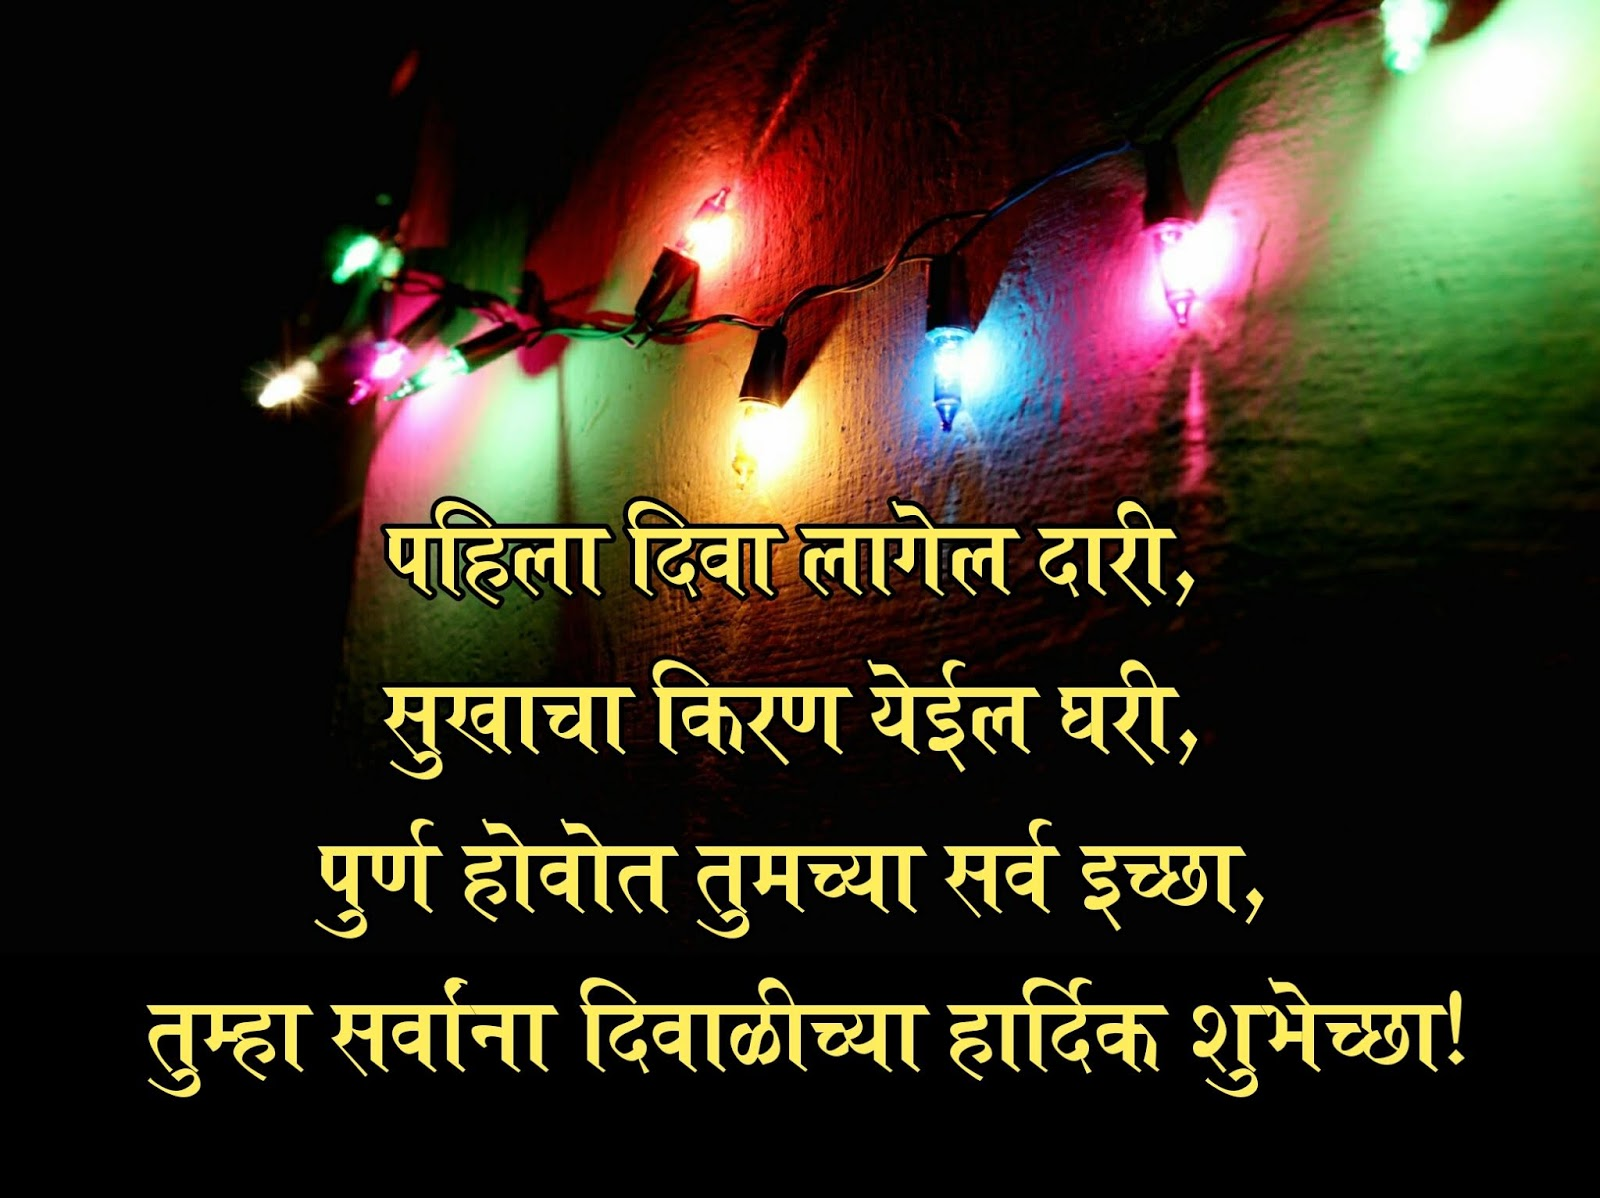 Happy Diwali Greetings In Marathi 2018 Language Font